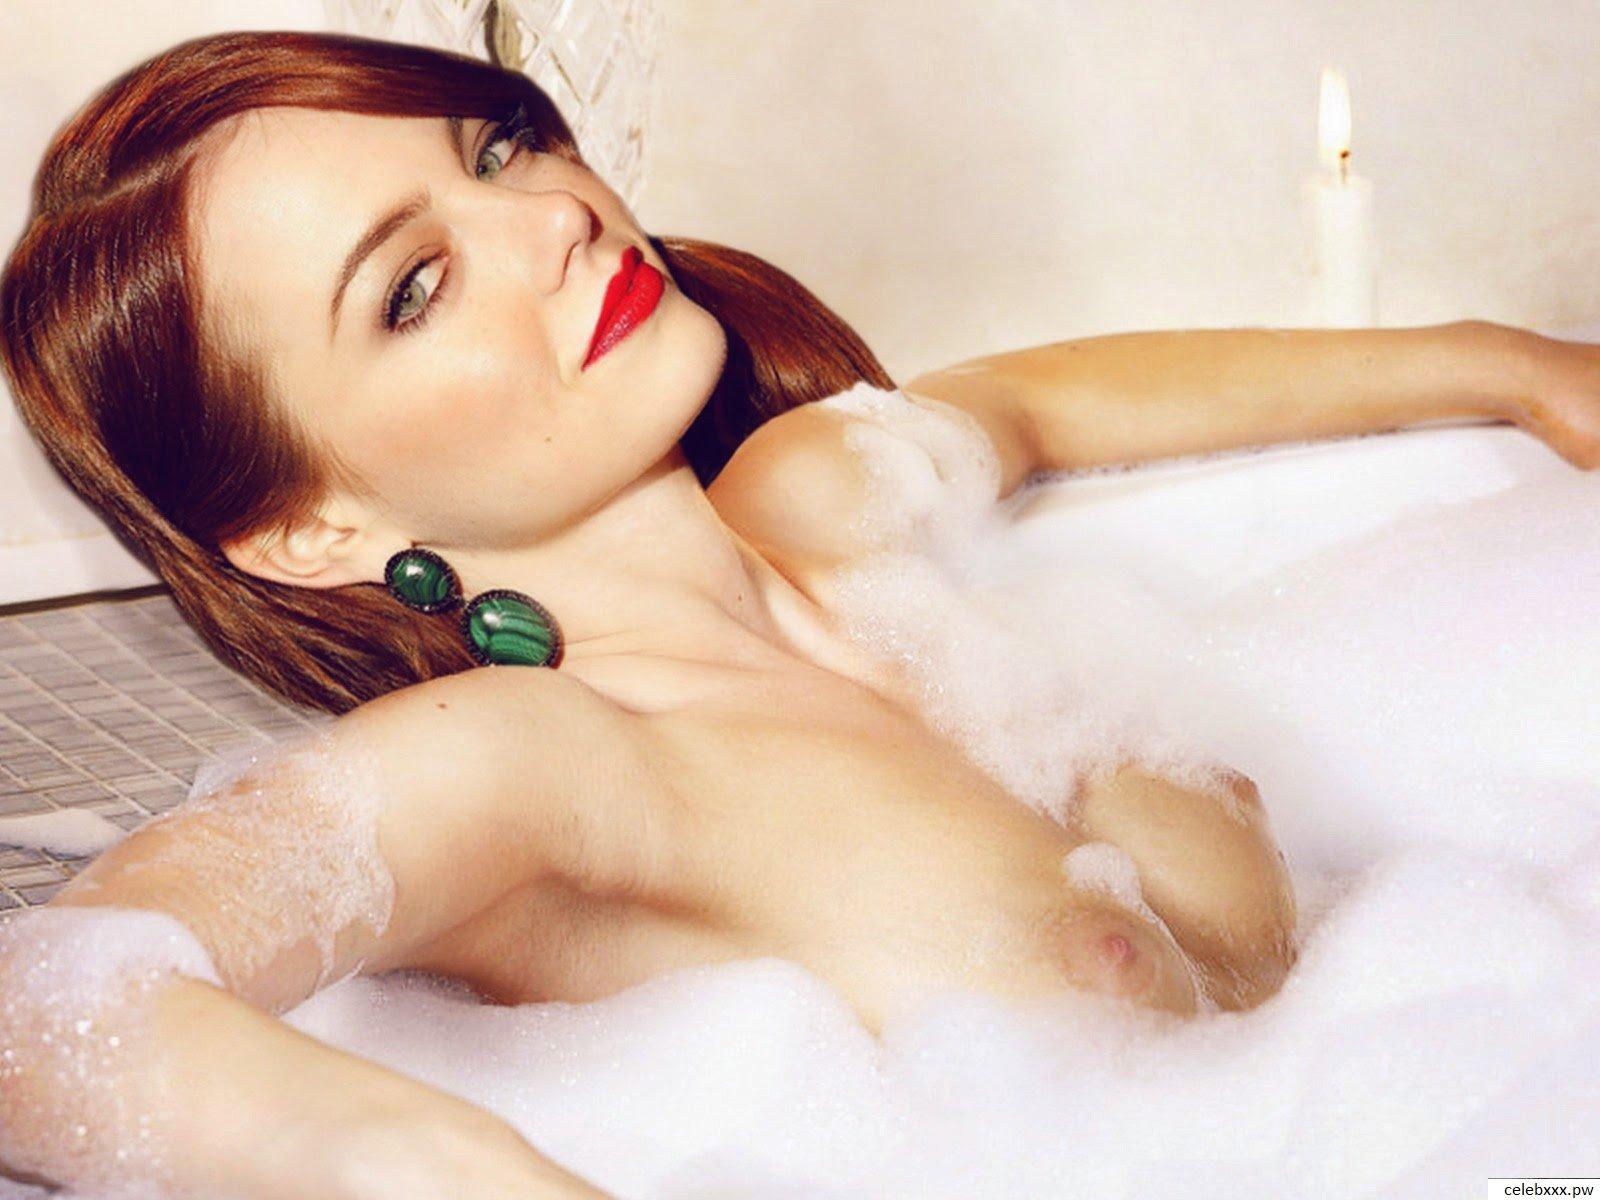 emma-stone-nude1